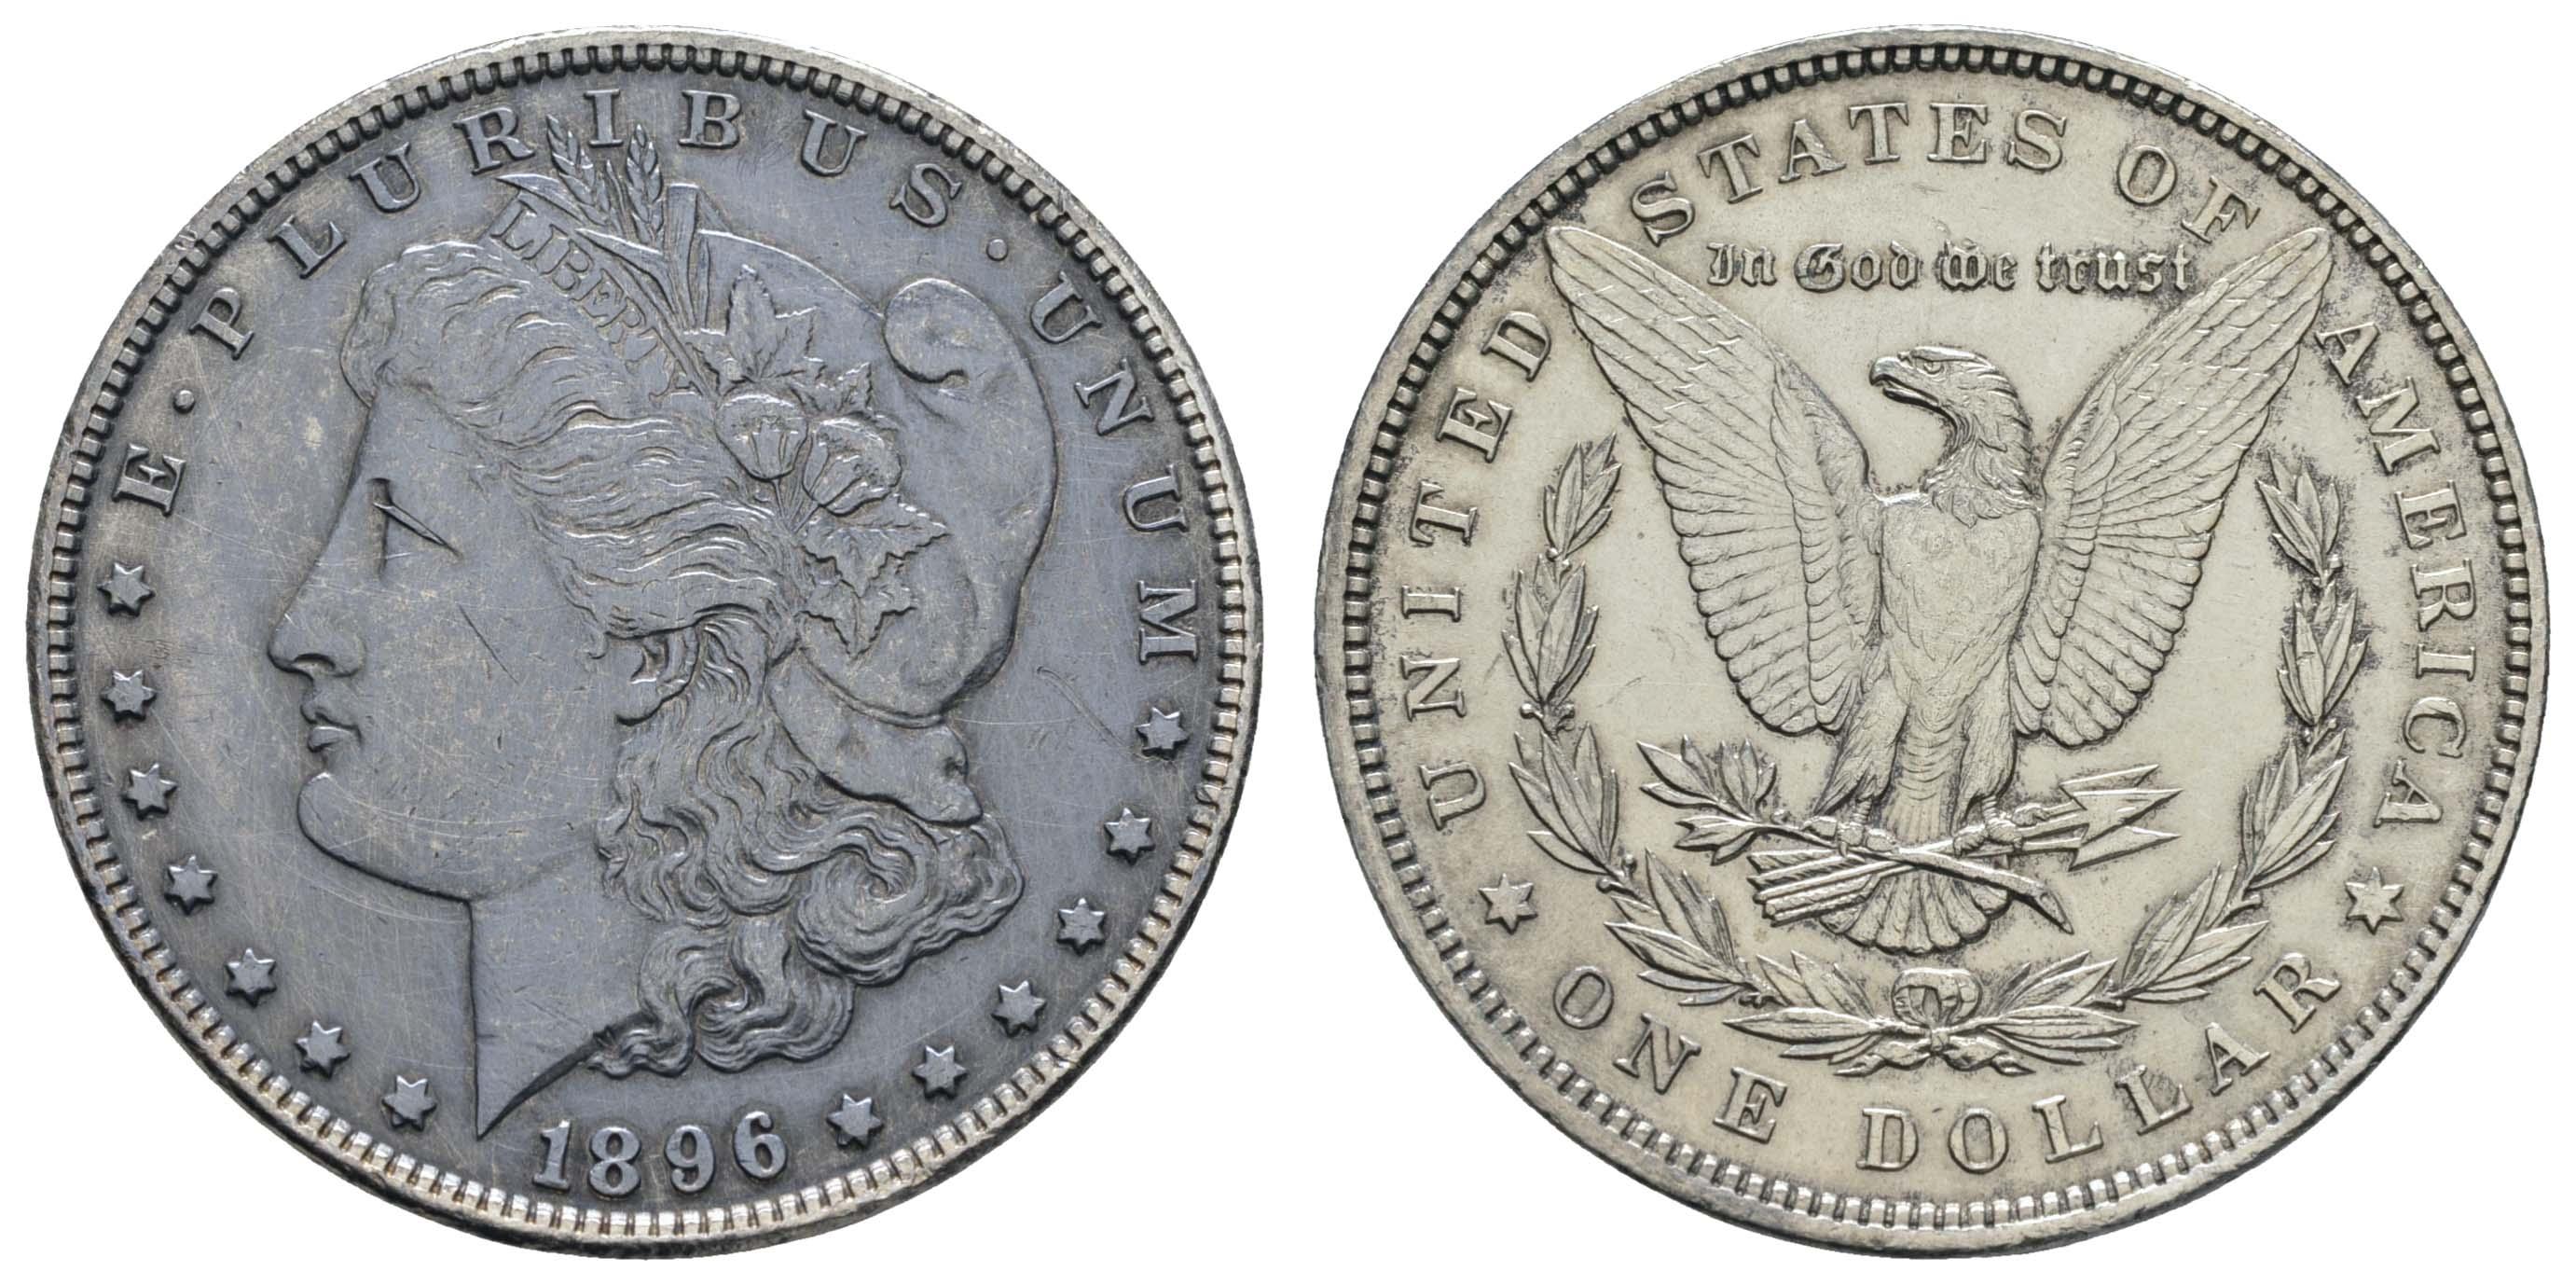 Lot 2150 - übersee usa -  Auktionshaus Ulrich Felzmann GmbH & Co. KG Coins single lots